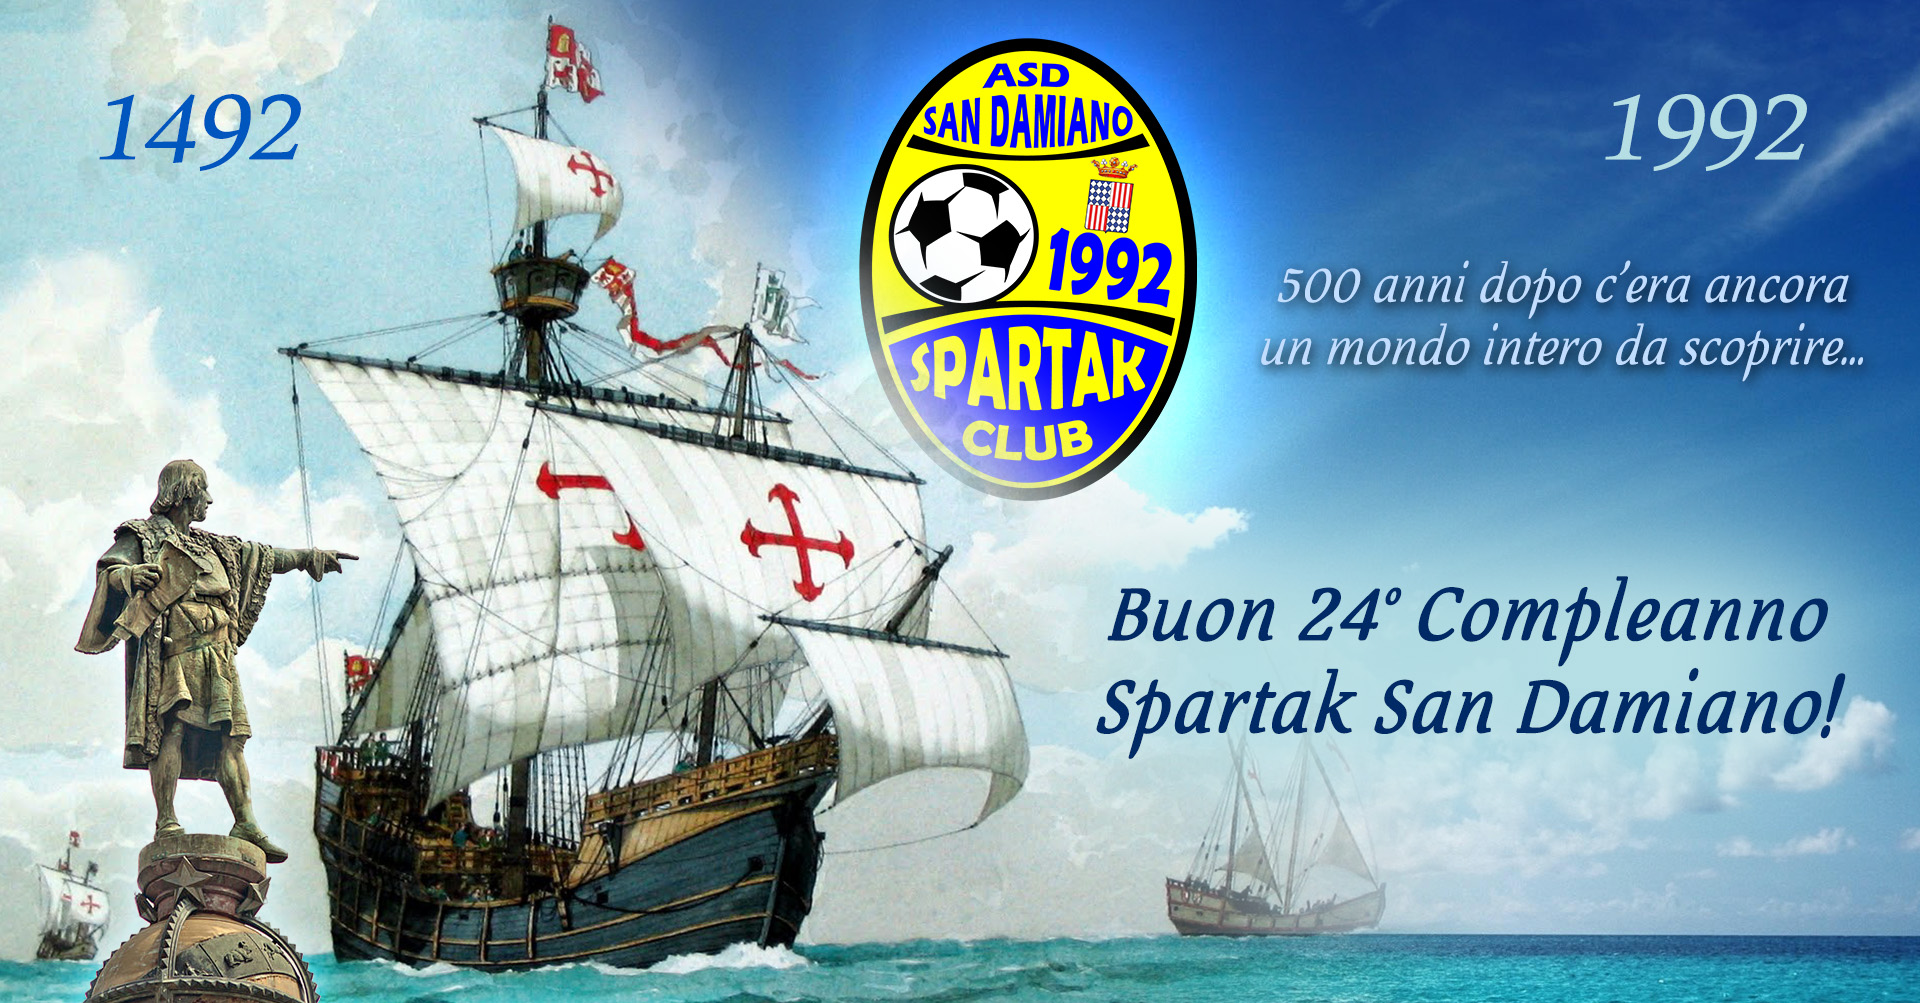 Buon Compleanno Spartak Spartak San Damiano